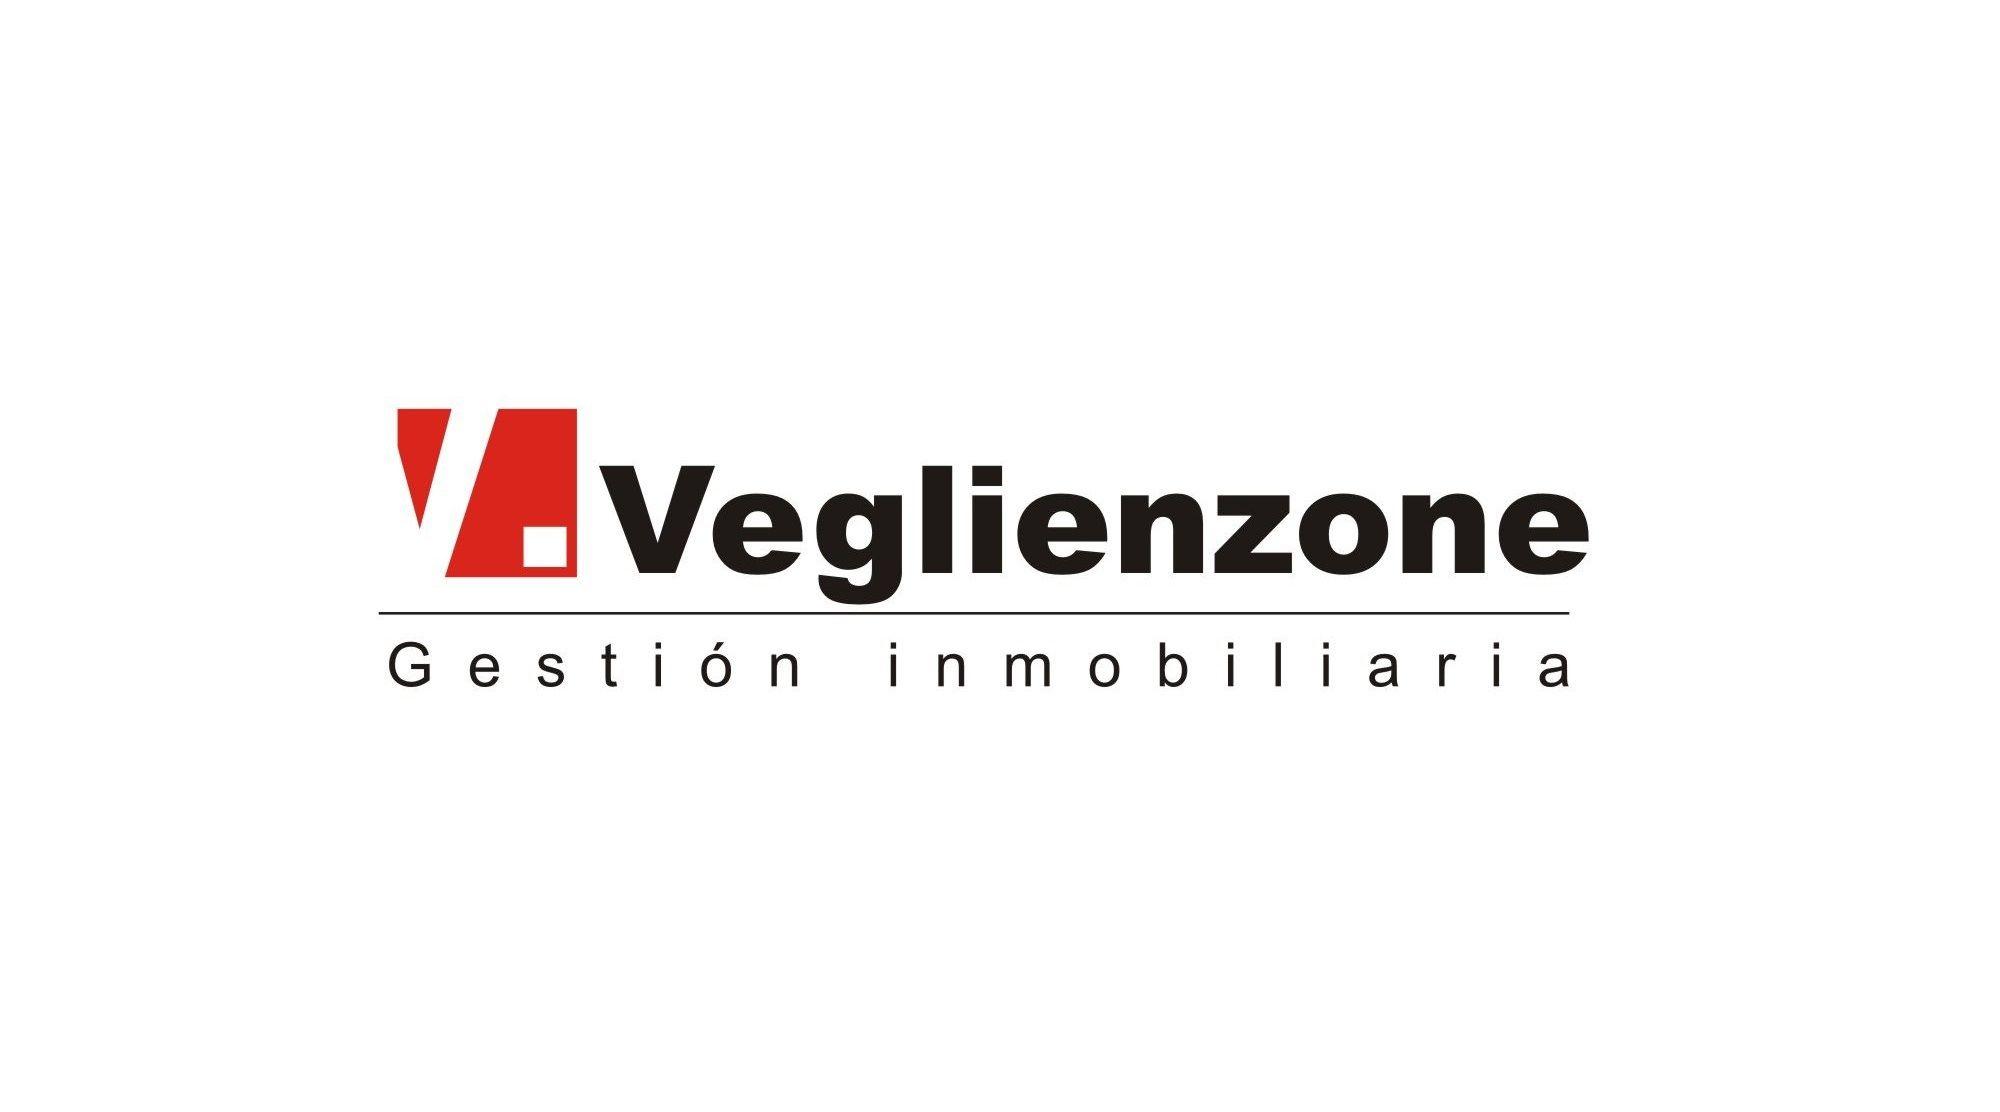 Logo de  Veglienzone Gestion Inmobiliaria